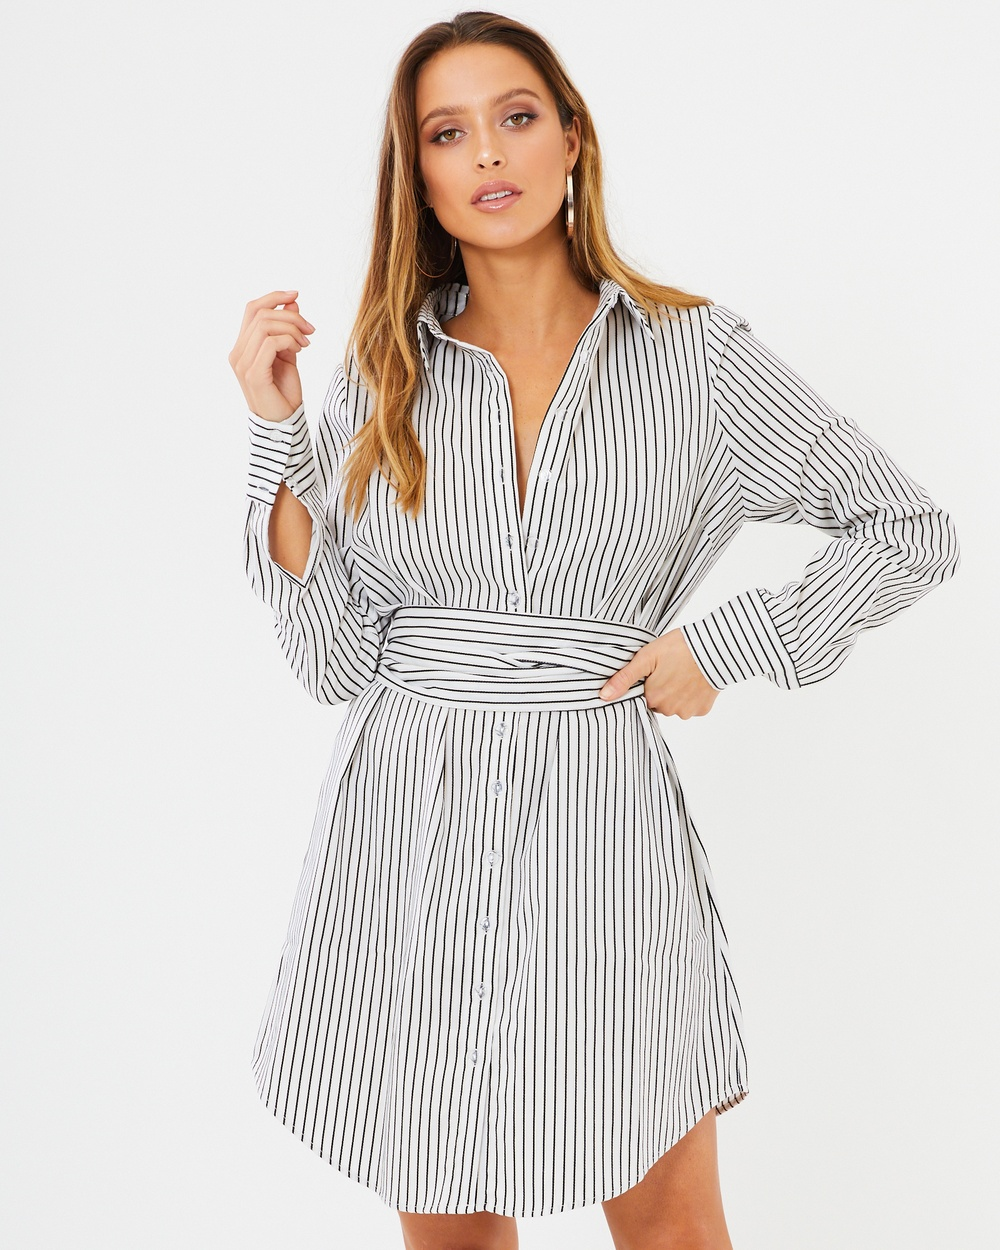 Calli Luella Shirt Dress Dresses Black Stripe Luella Shirt Dress